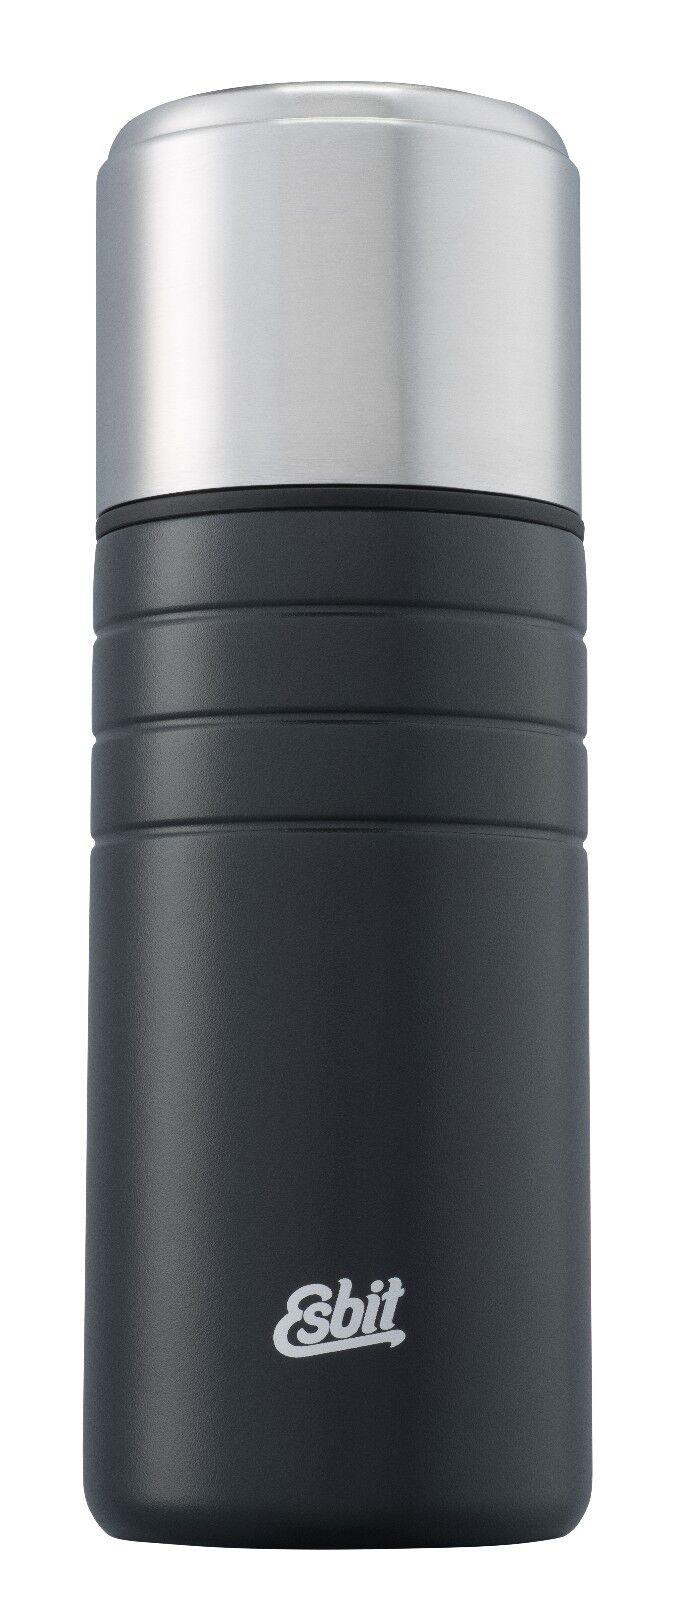 Esbit Esbit Esbit Isolierflasche 'Majoris' - 0,75 L schwarz 2a88f6